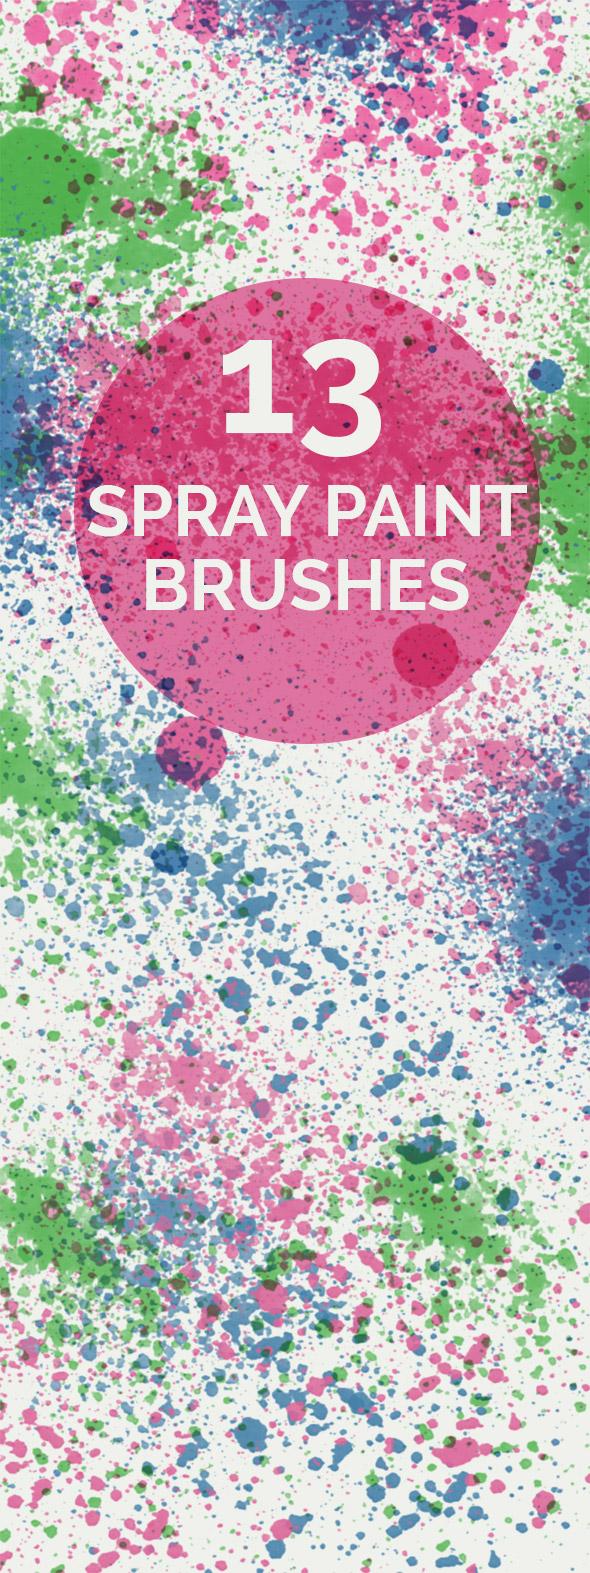 spray paint brushes small 1 13 Spray paint Photoshop brushes